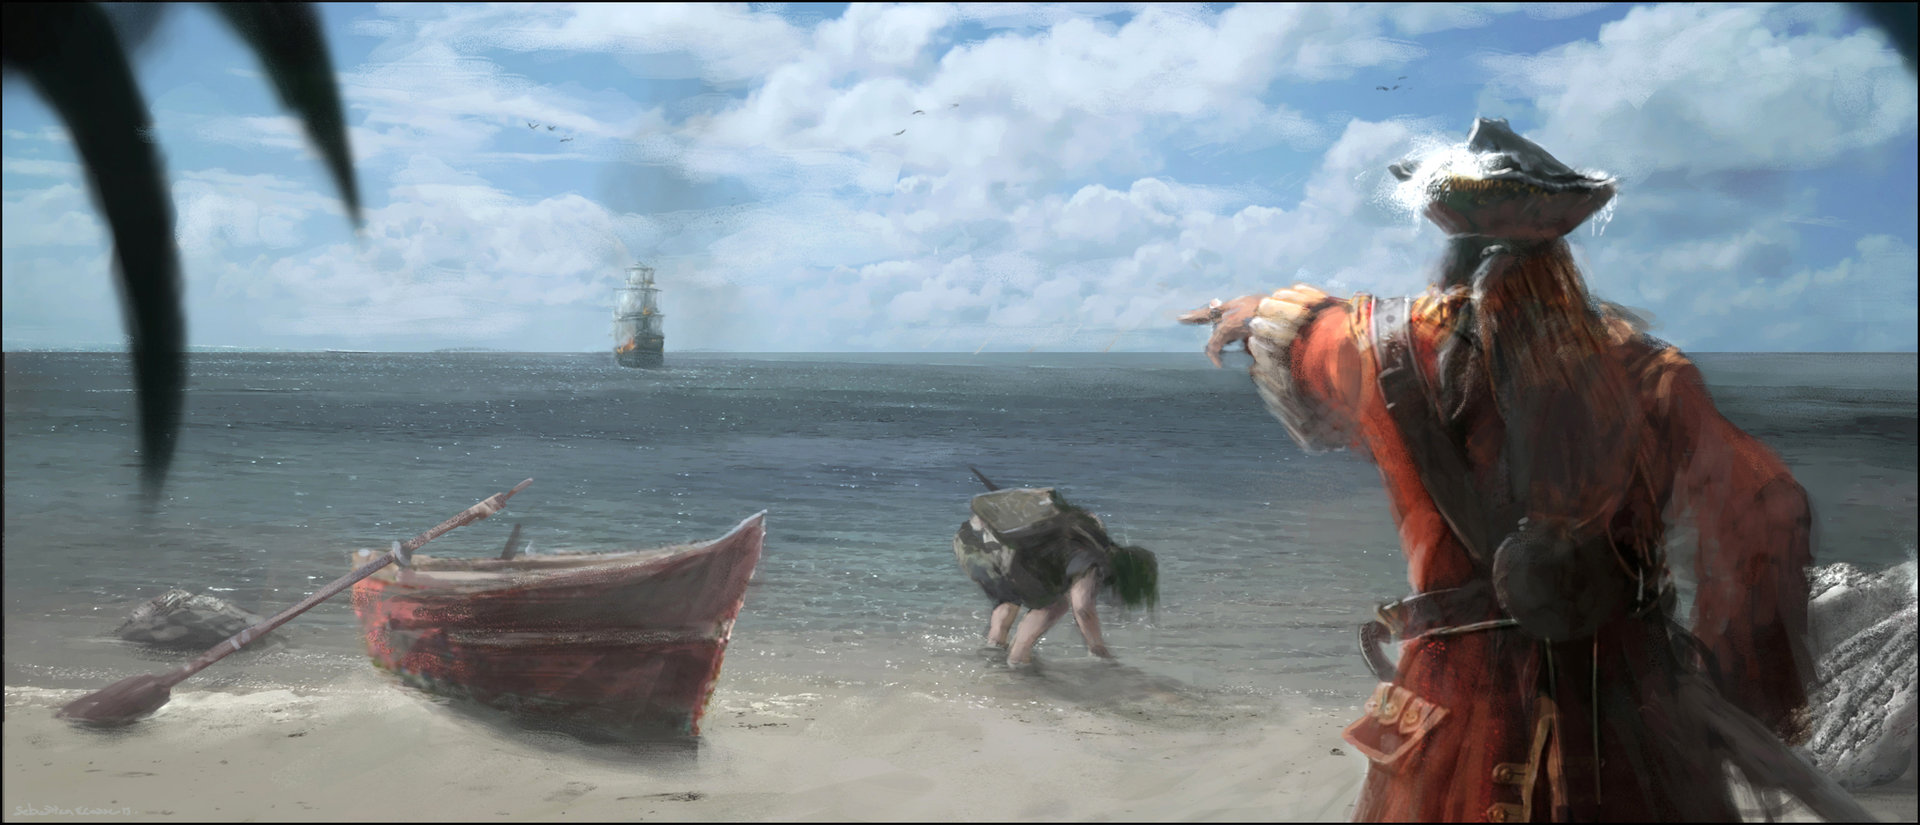 Sebastien ecosse corrected pirate tresor galion navire bateau ship caraibes matte painting illustration sebastien ecosse concept site 4